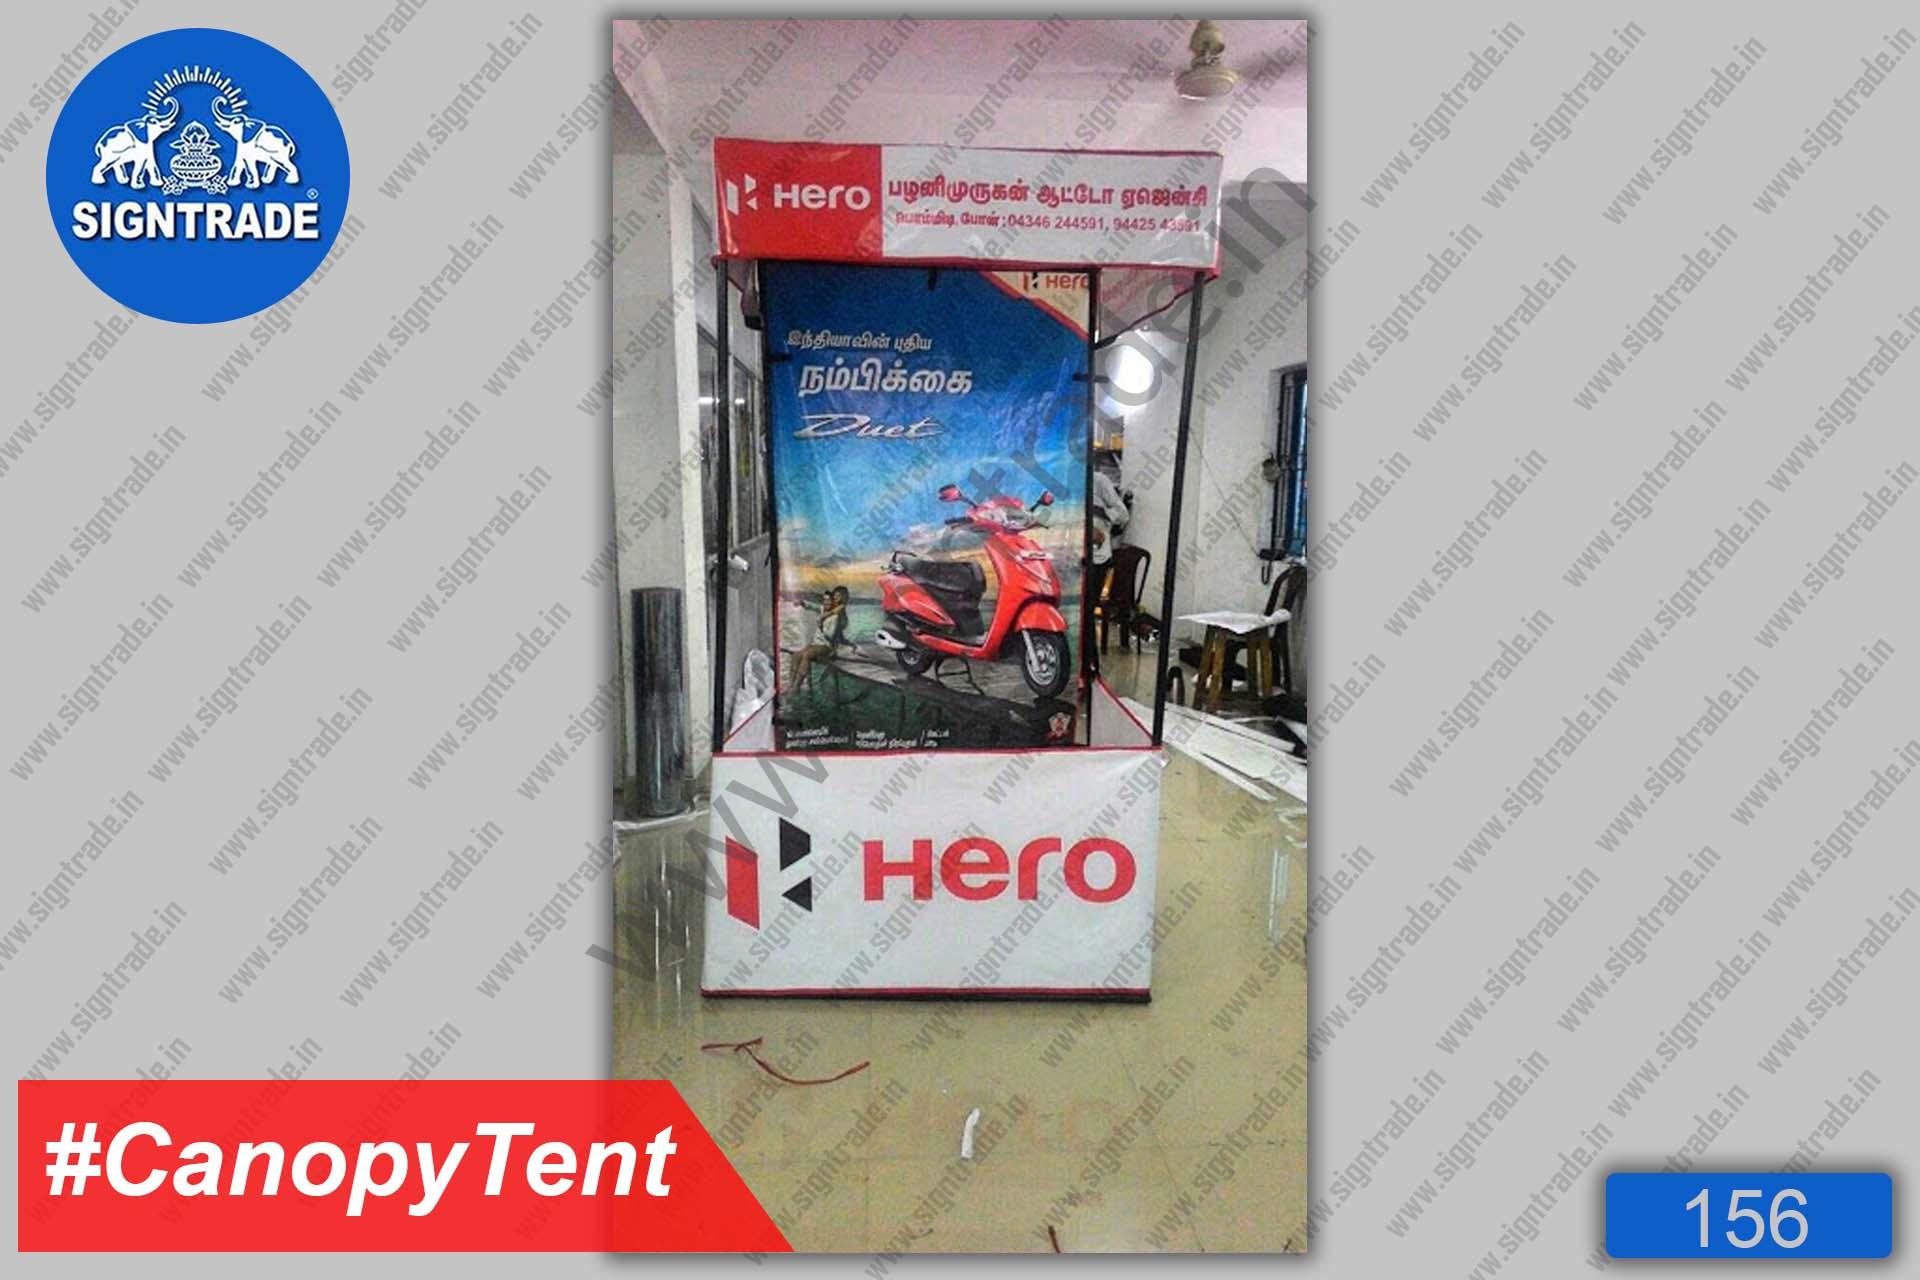 Flat Roof Tent, Canopy Tent - Hero - Palani Murugan Auto Agency